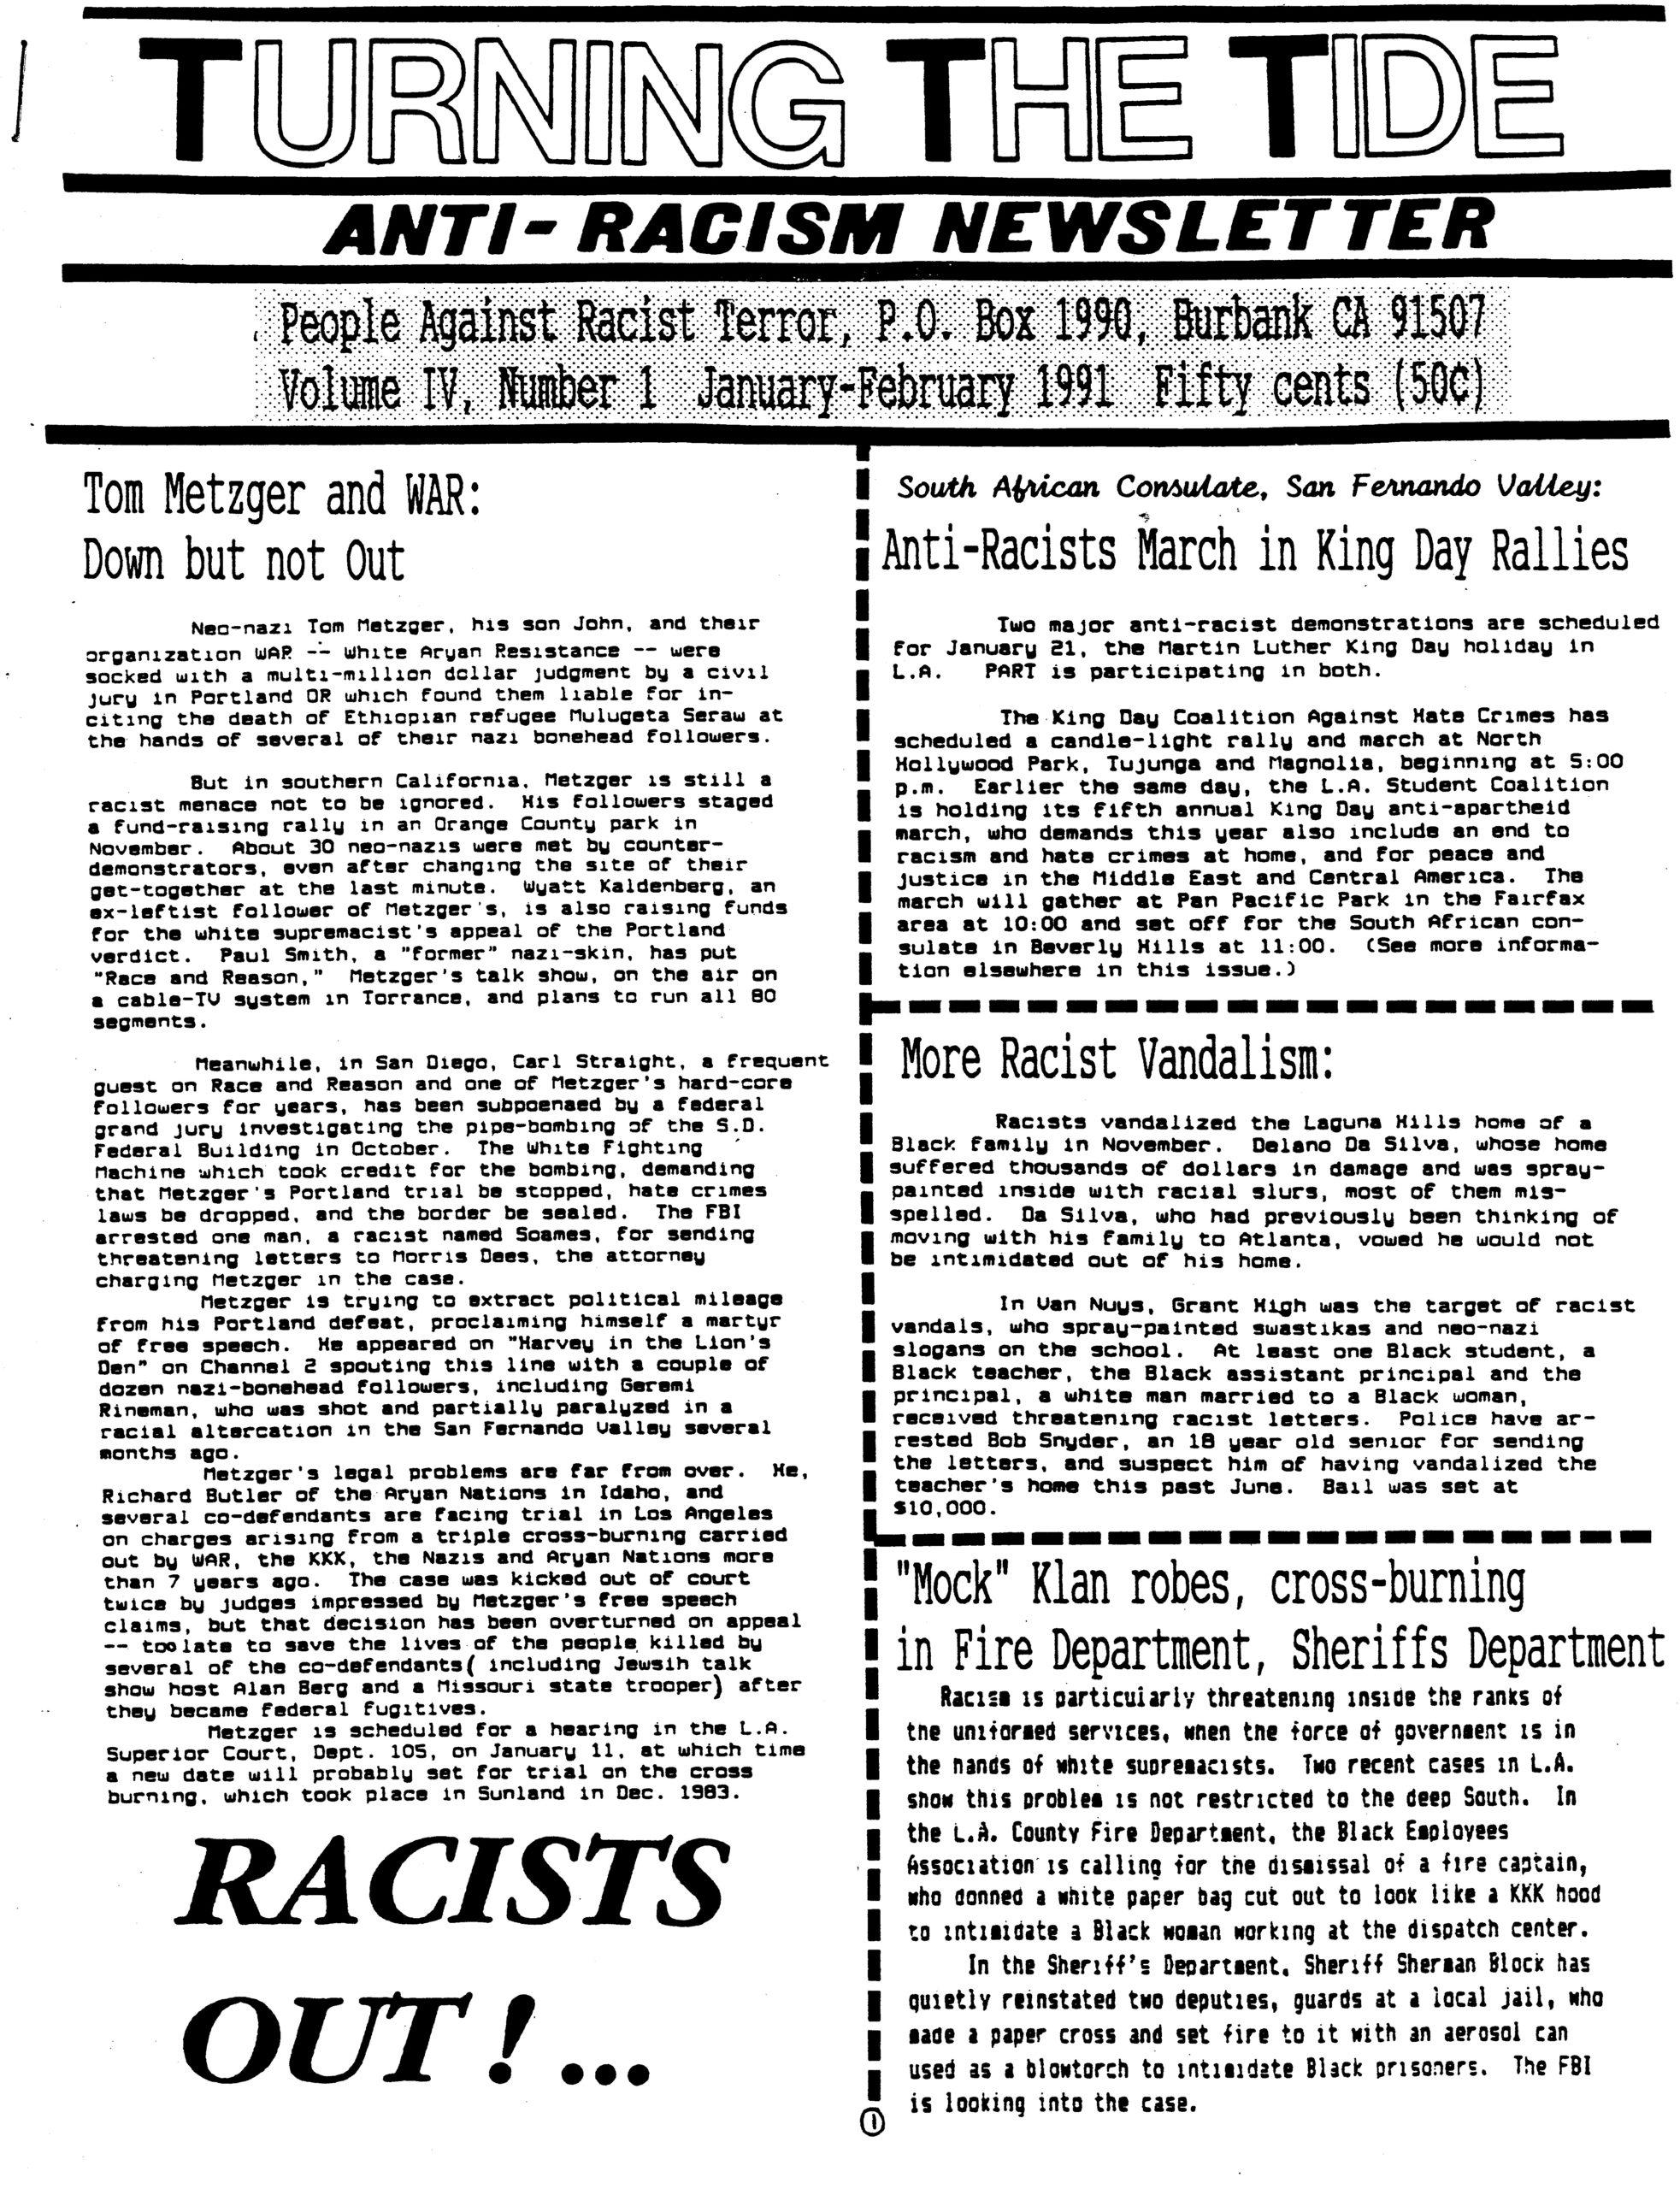 TTT Vol. 4, #1 Jan.-Feb. 1991